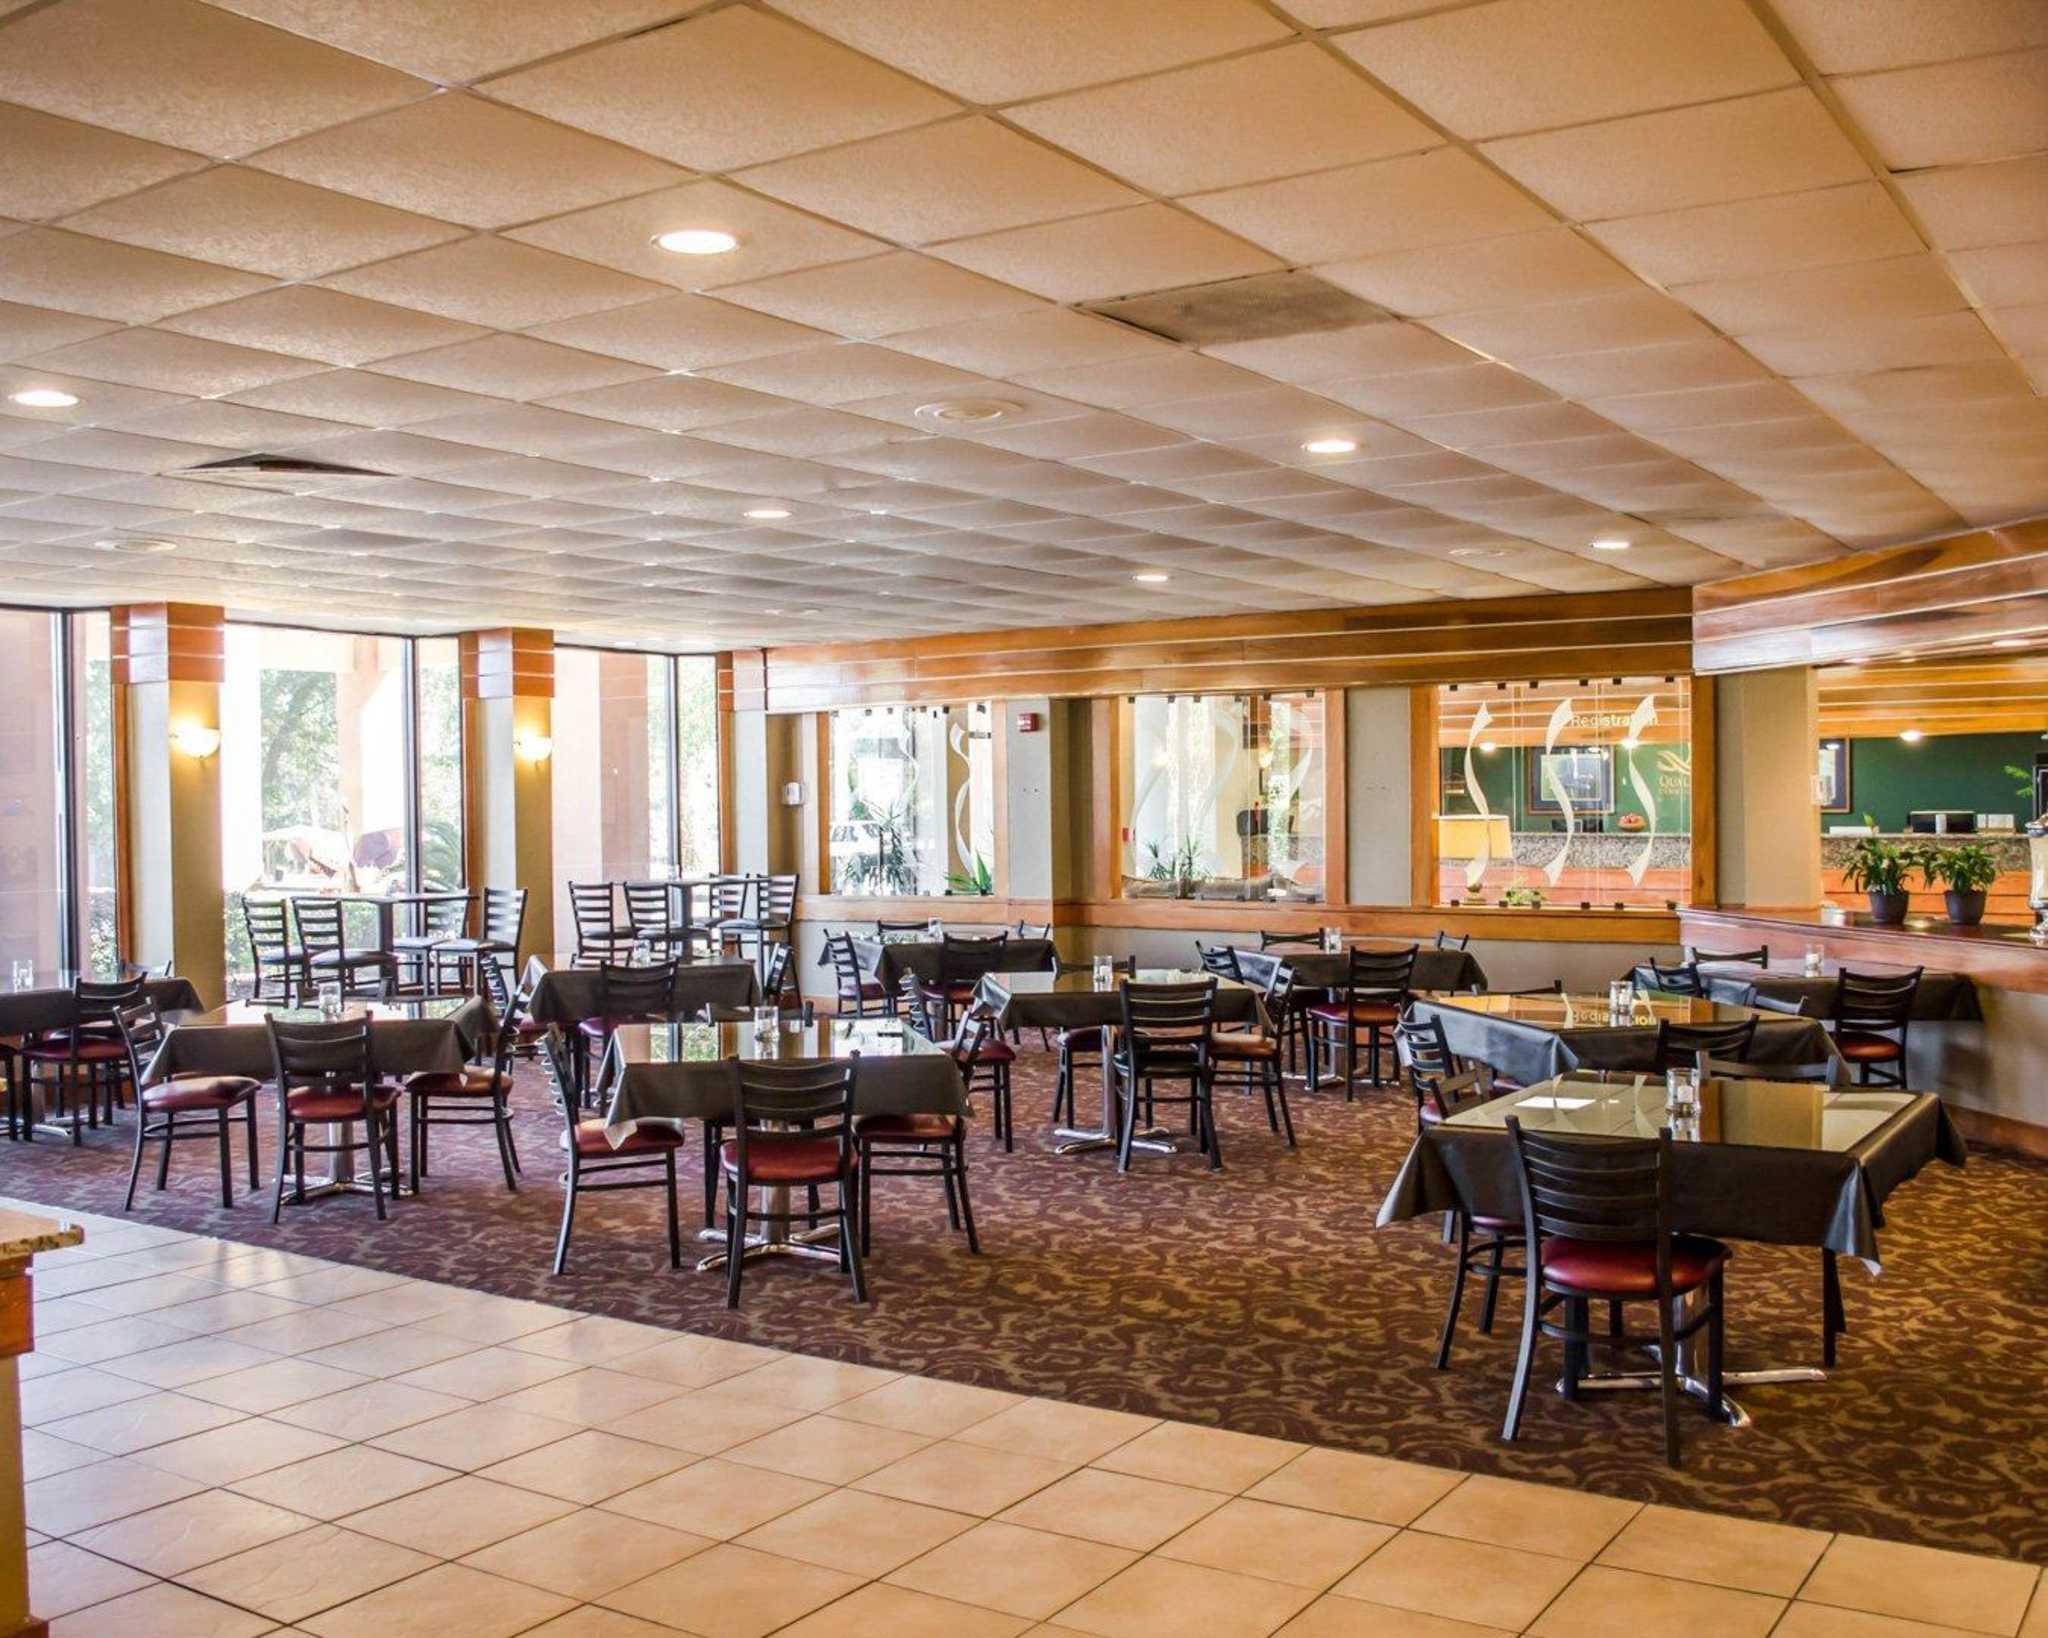 Quality Inn & Suites Pensacola Bayview in Pensacola, FL, photo #18